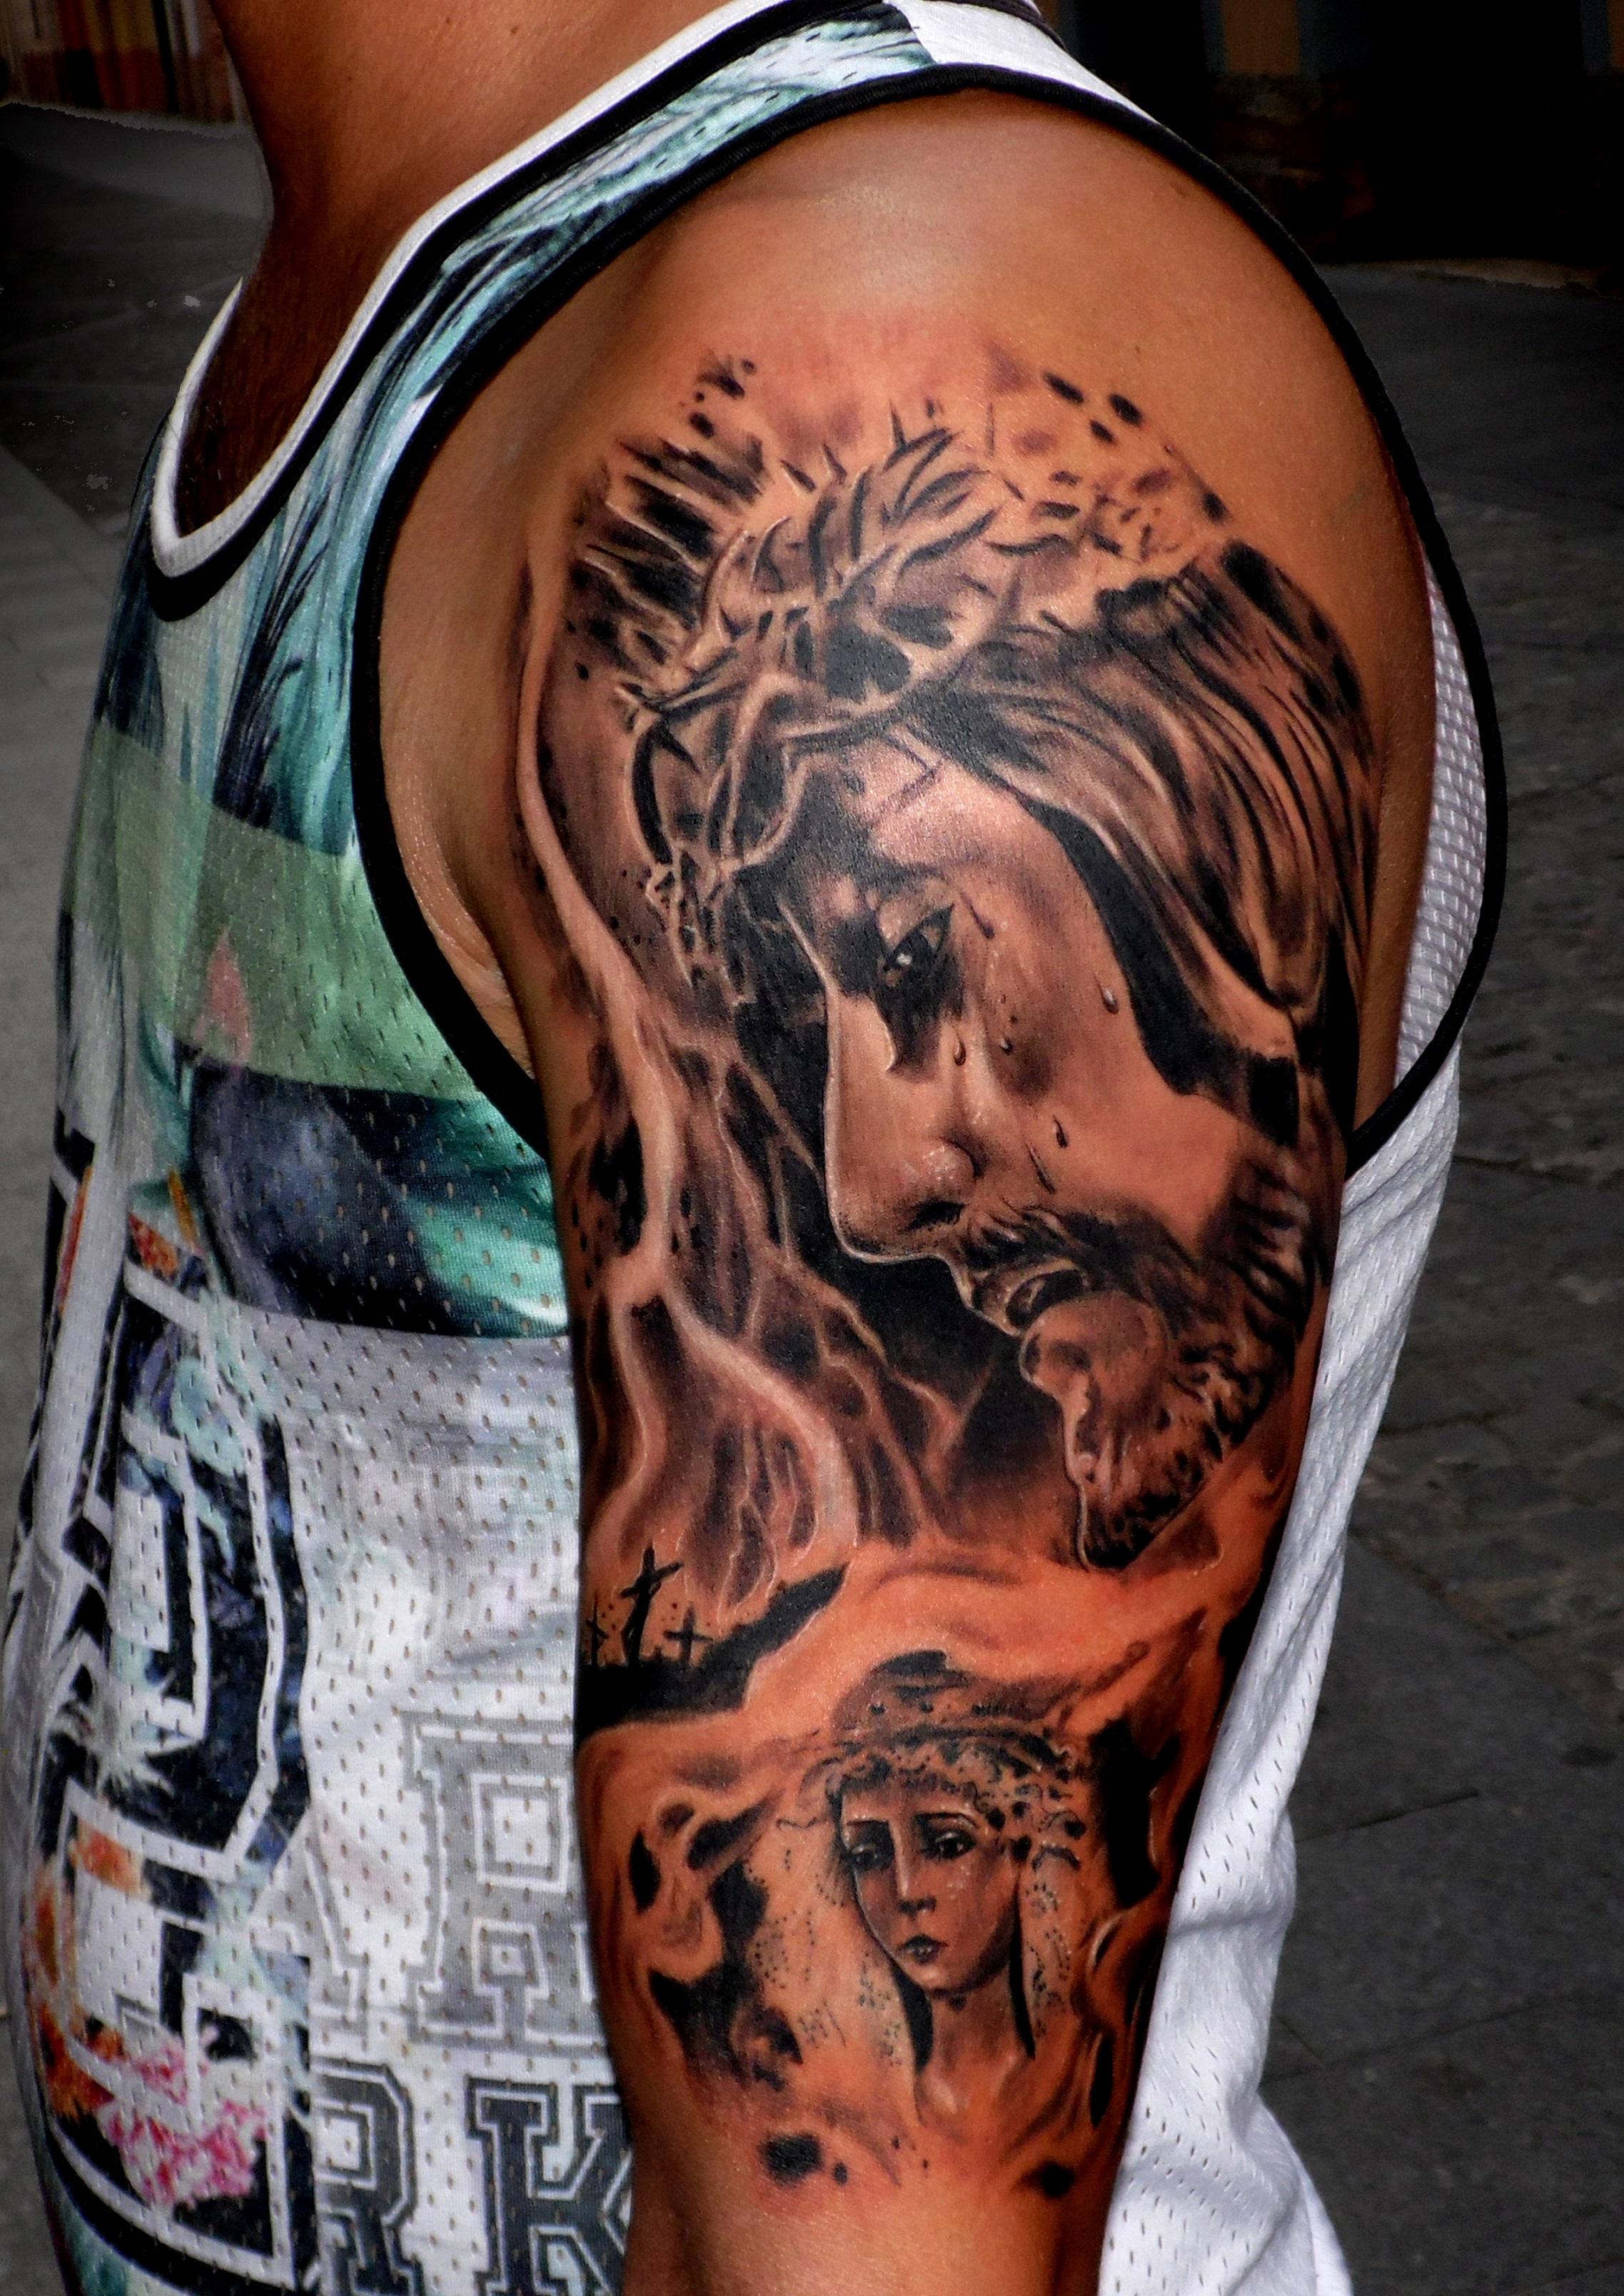 tatuaje tattoo realista retrato jesus cristo virgen campillo hombro brazo realista cruz 13depicas jaca huesca